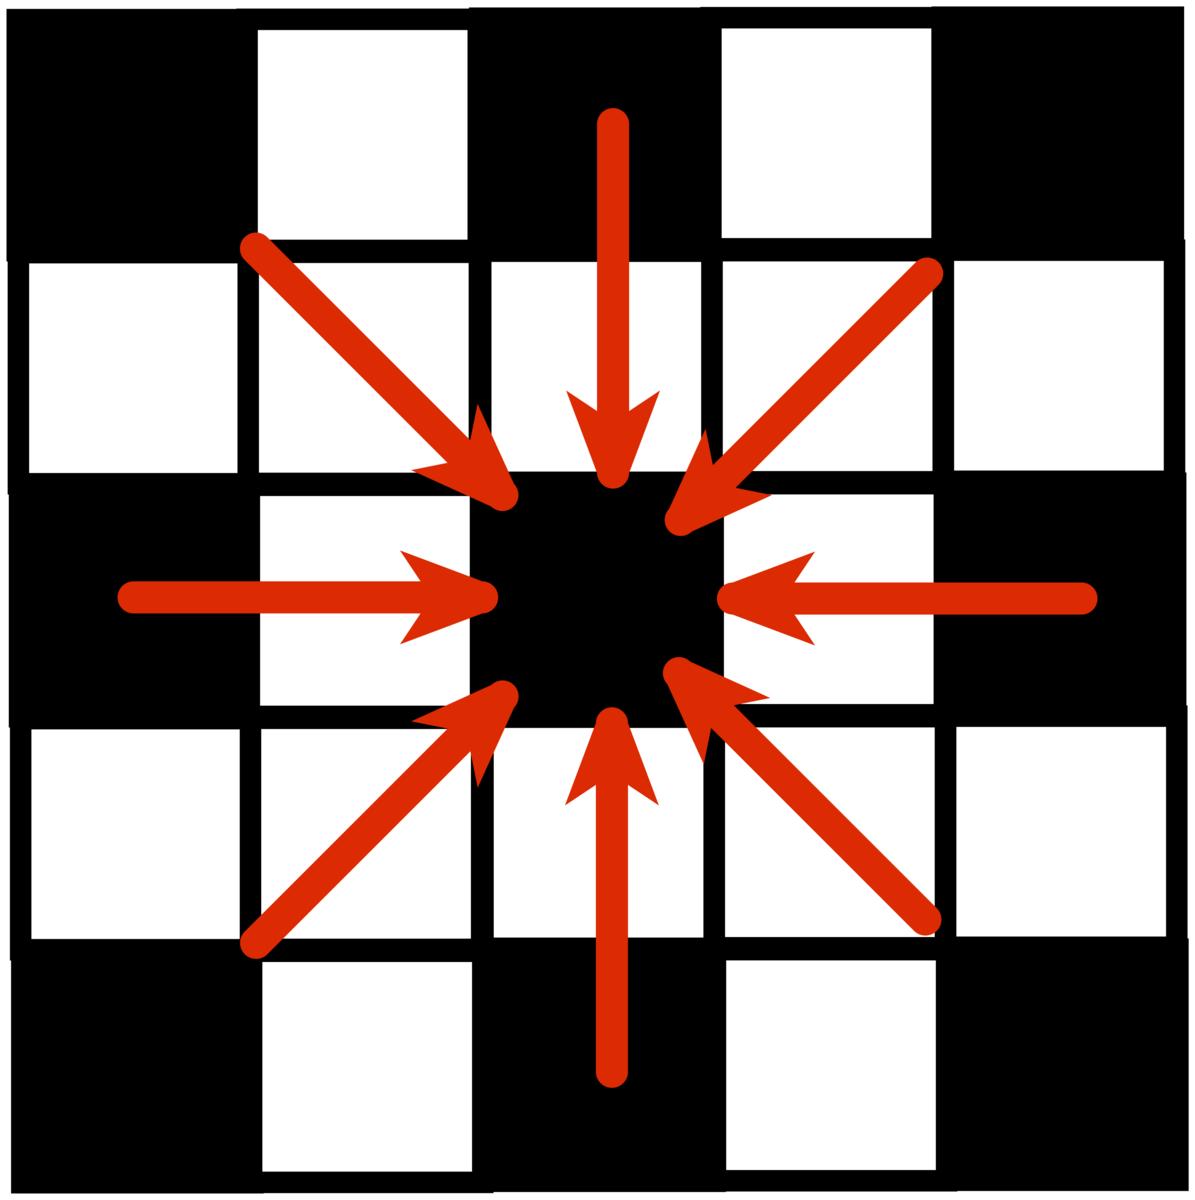 f:id:Lynx-EyED:20201024171425p:plain